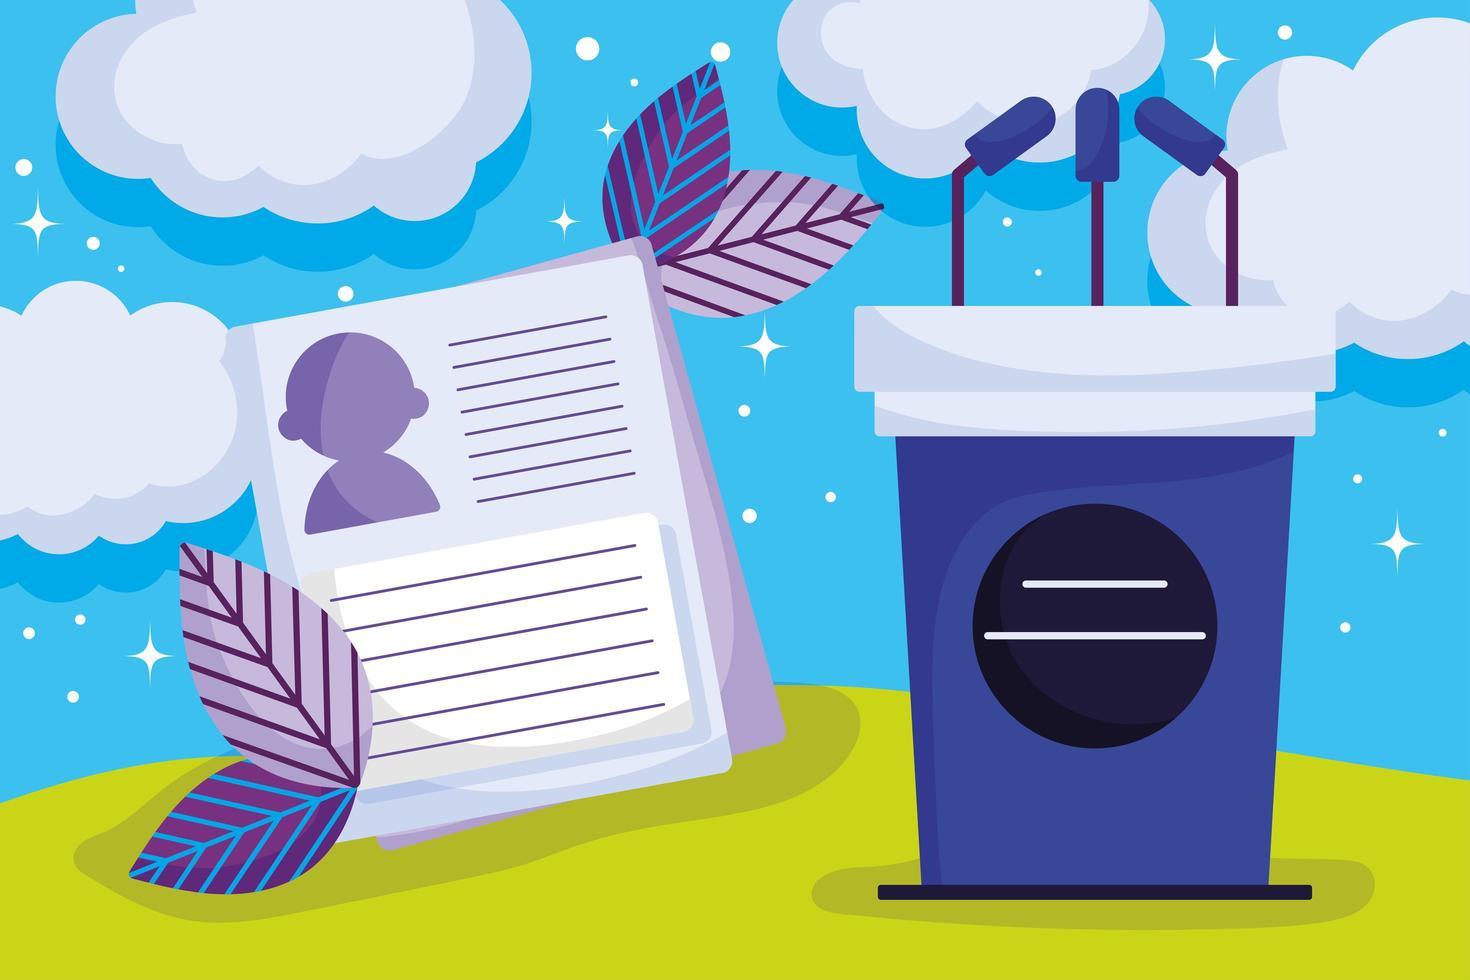 Speaking podium with microphones outdoors vector